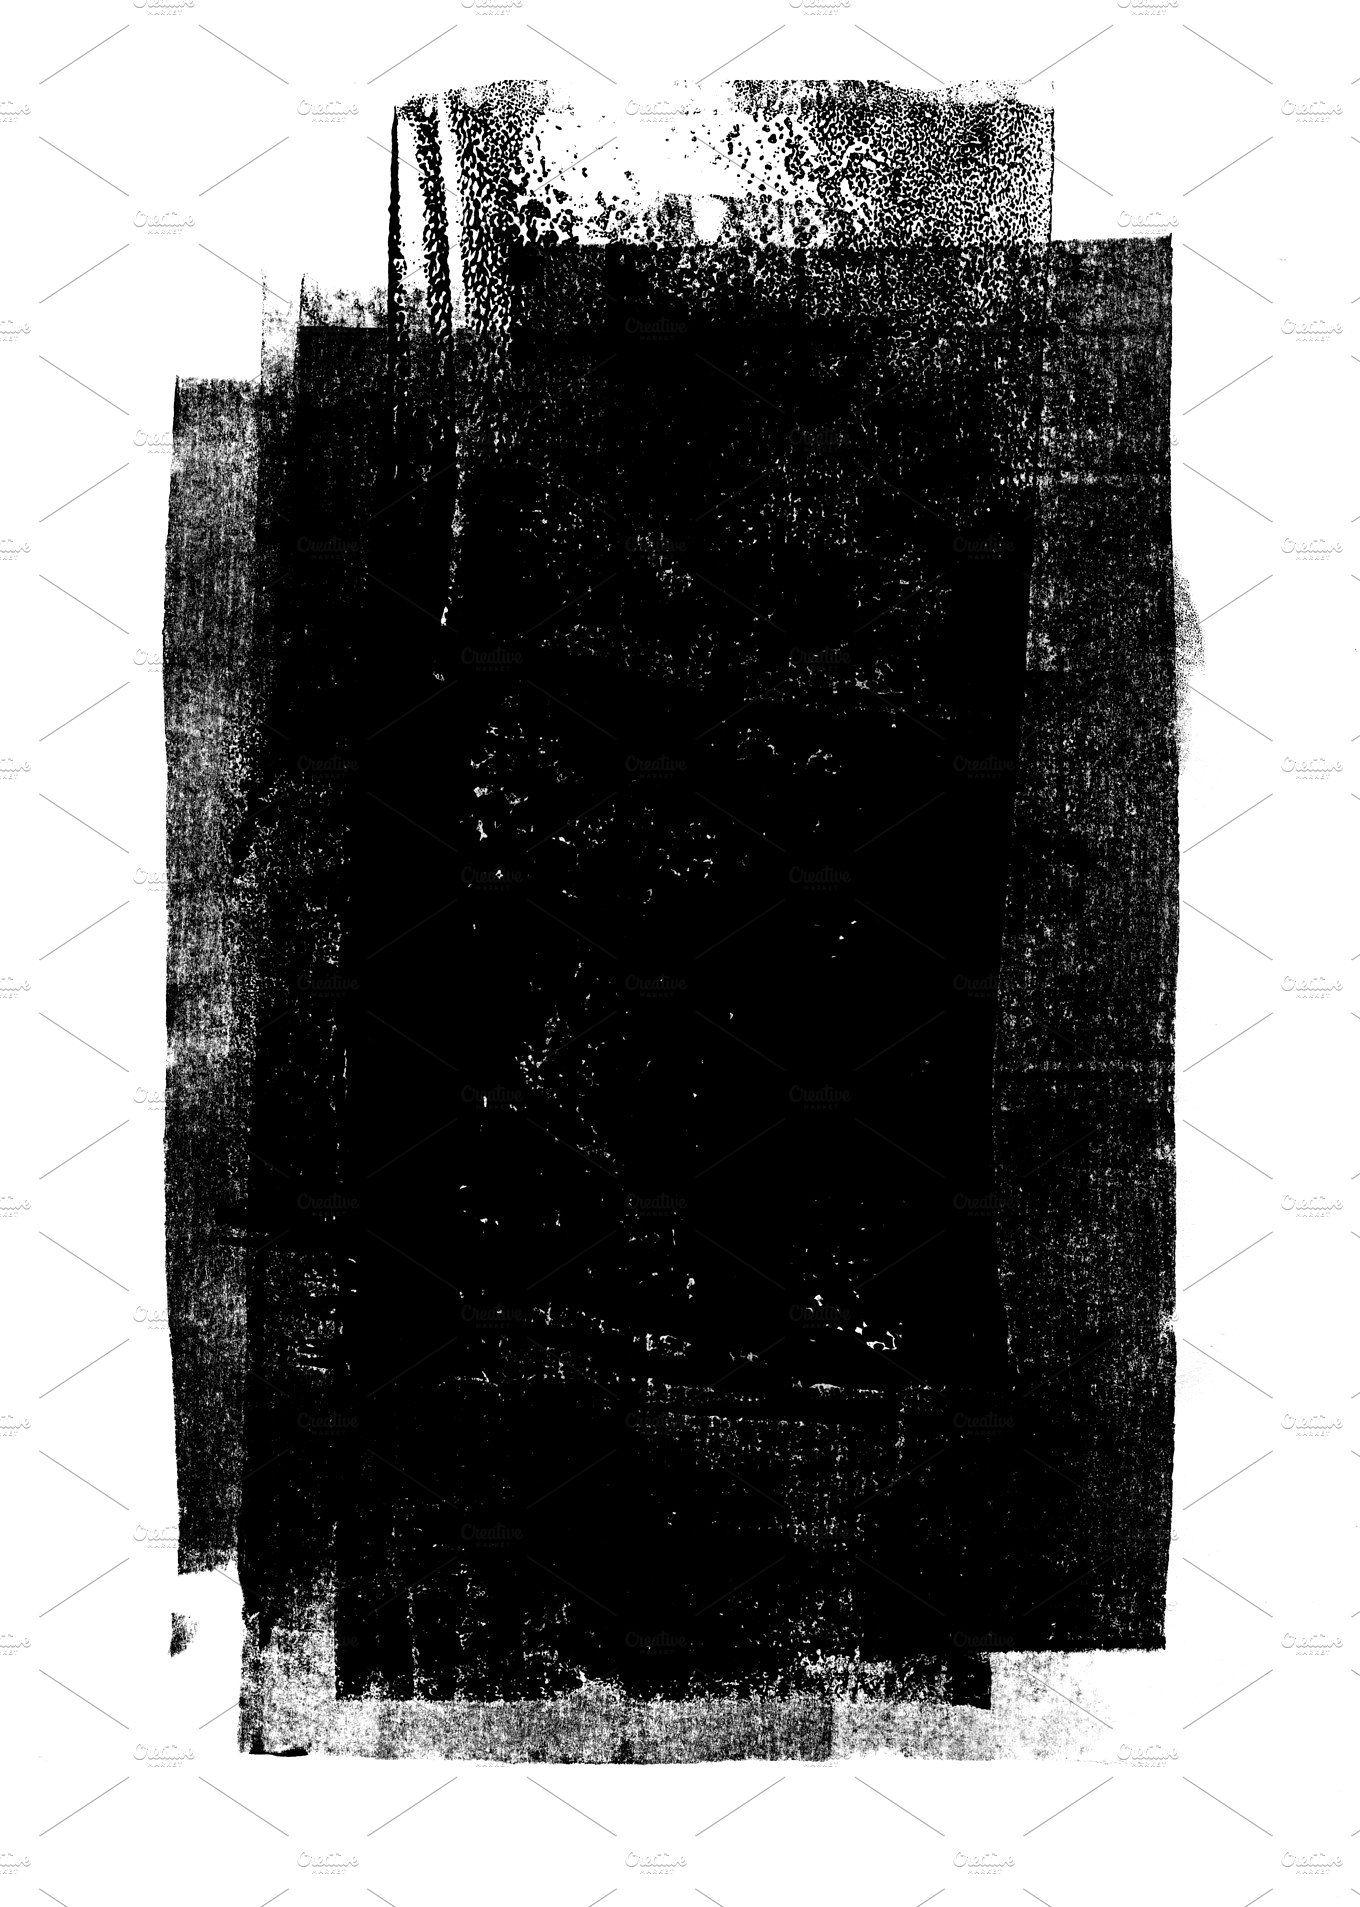 Black Rolled Ink Texture Design De Cartazes Imagens Para Slides